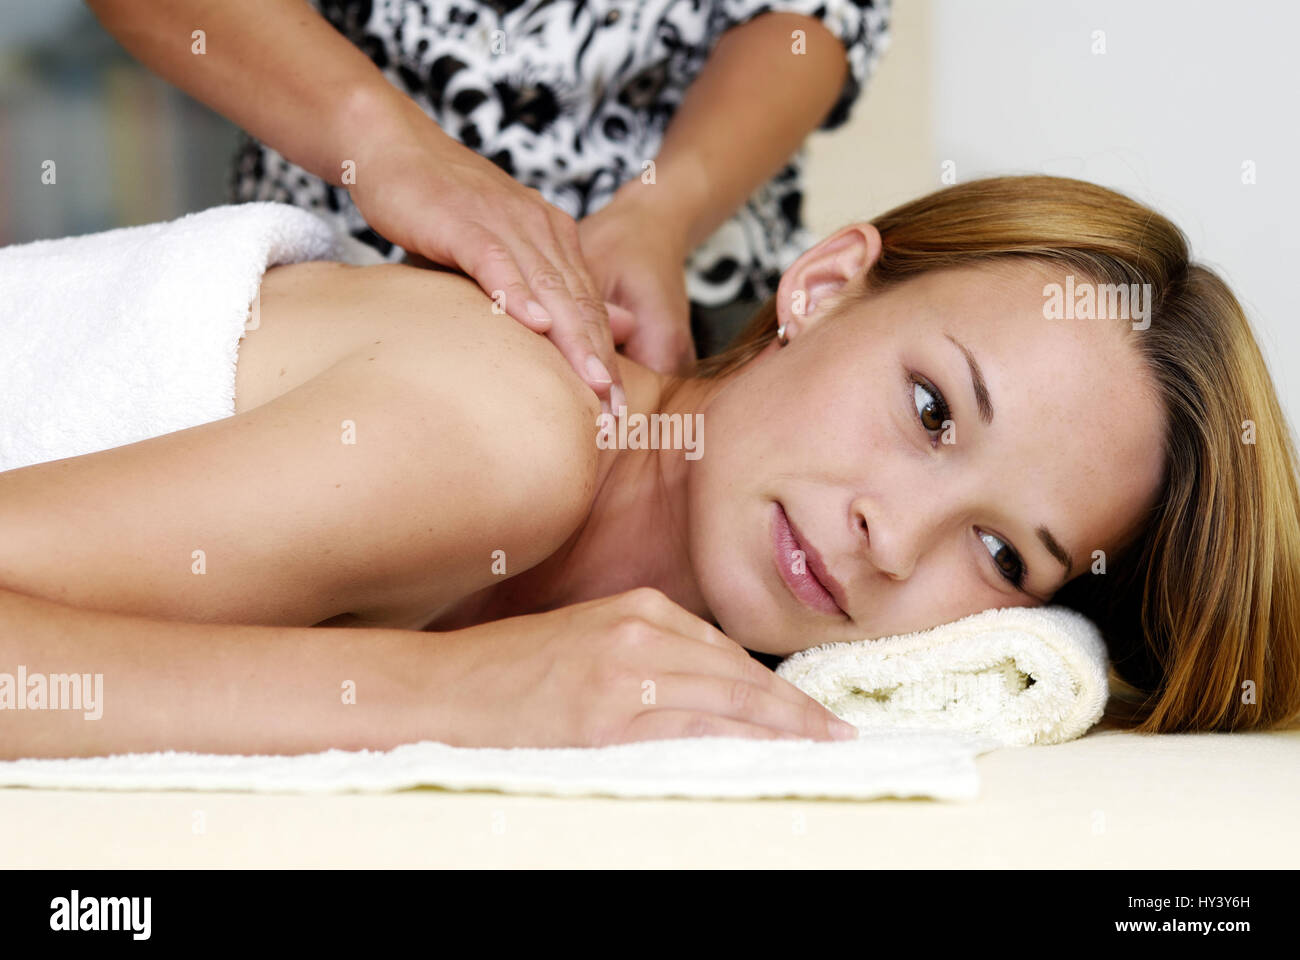 Young woman with massage treatment, Junge Frau bei Massagebehandlung Stock Photo